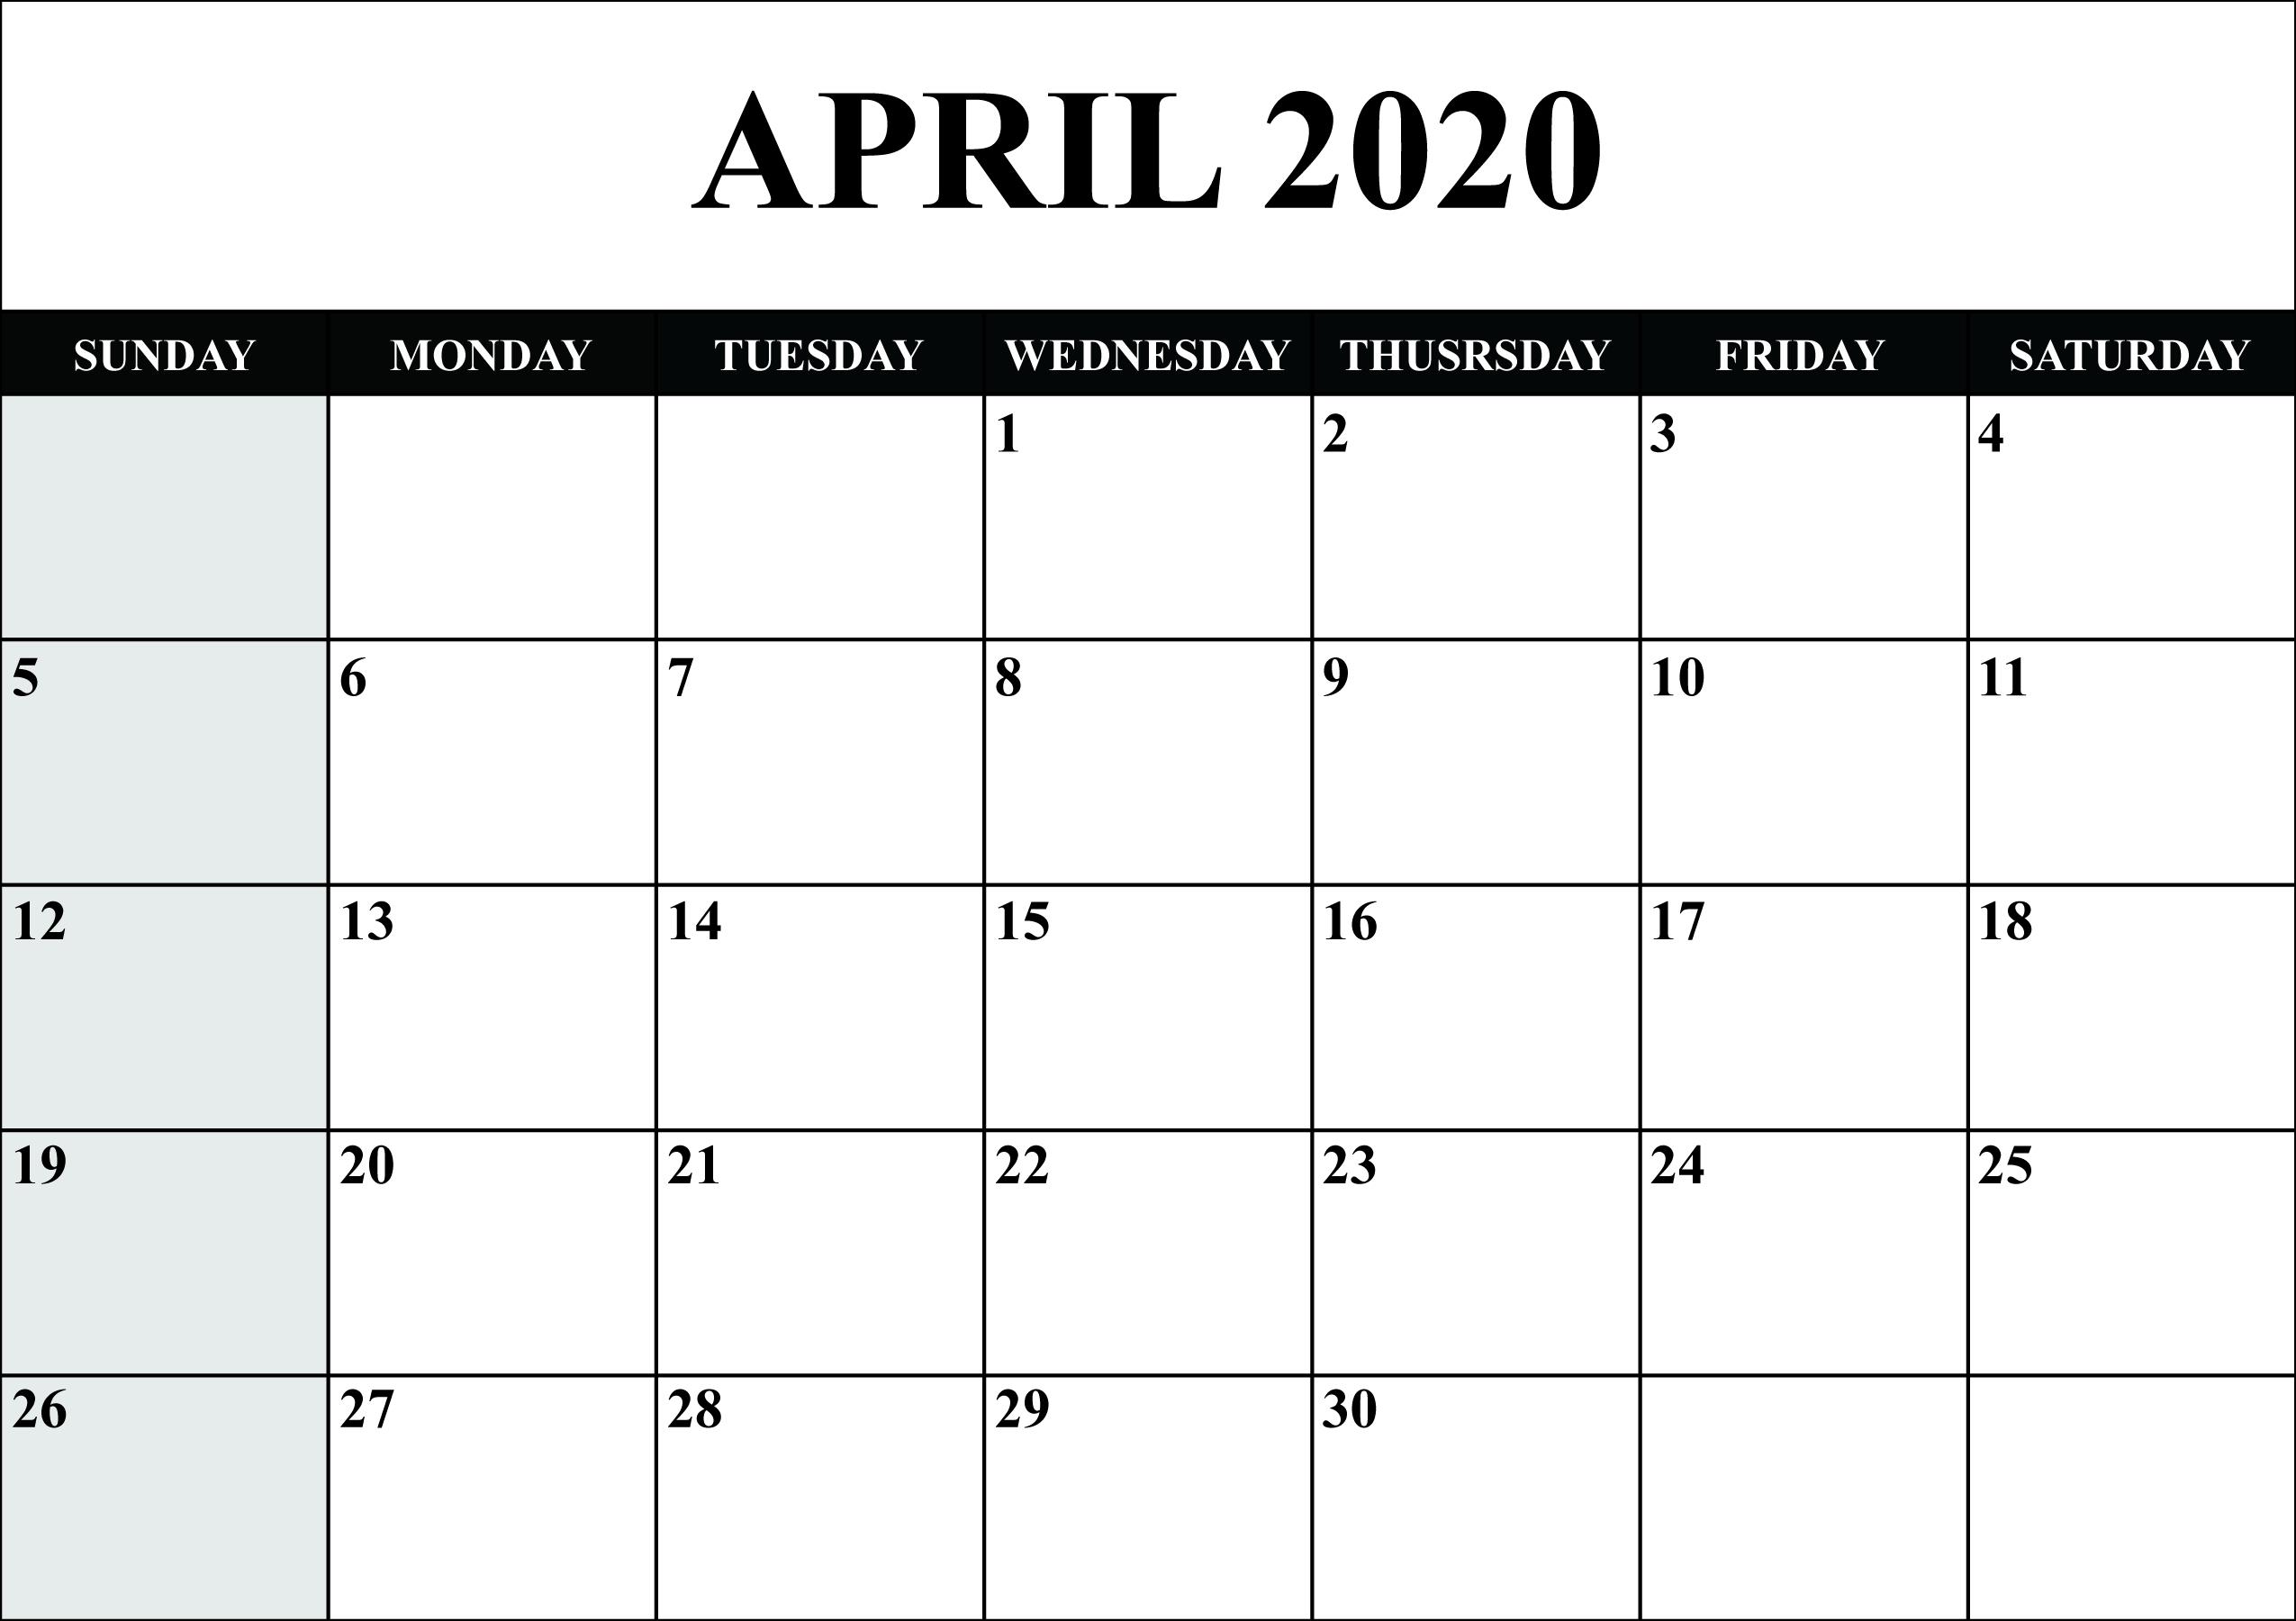 April 2020 Calendar With Holidays | Free Printable